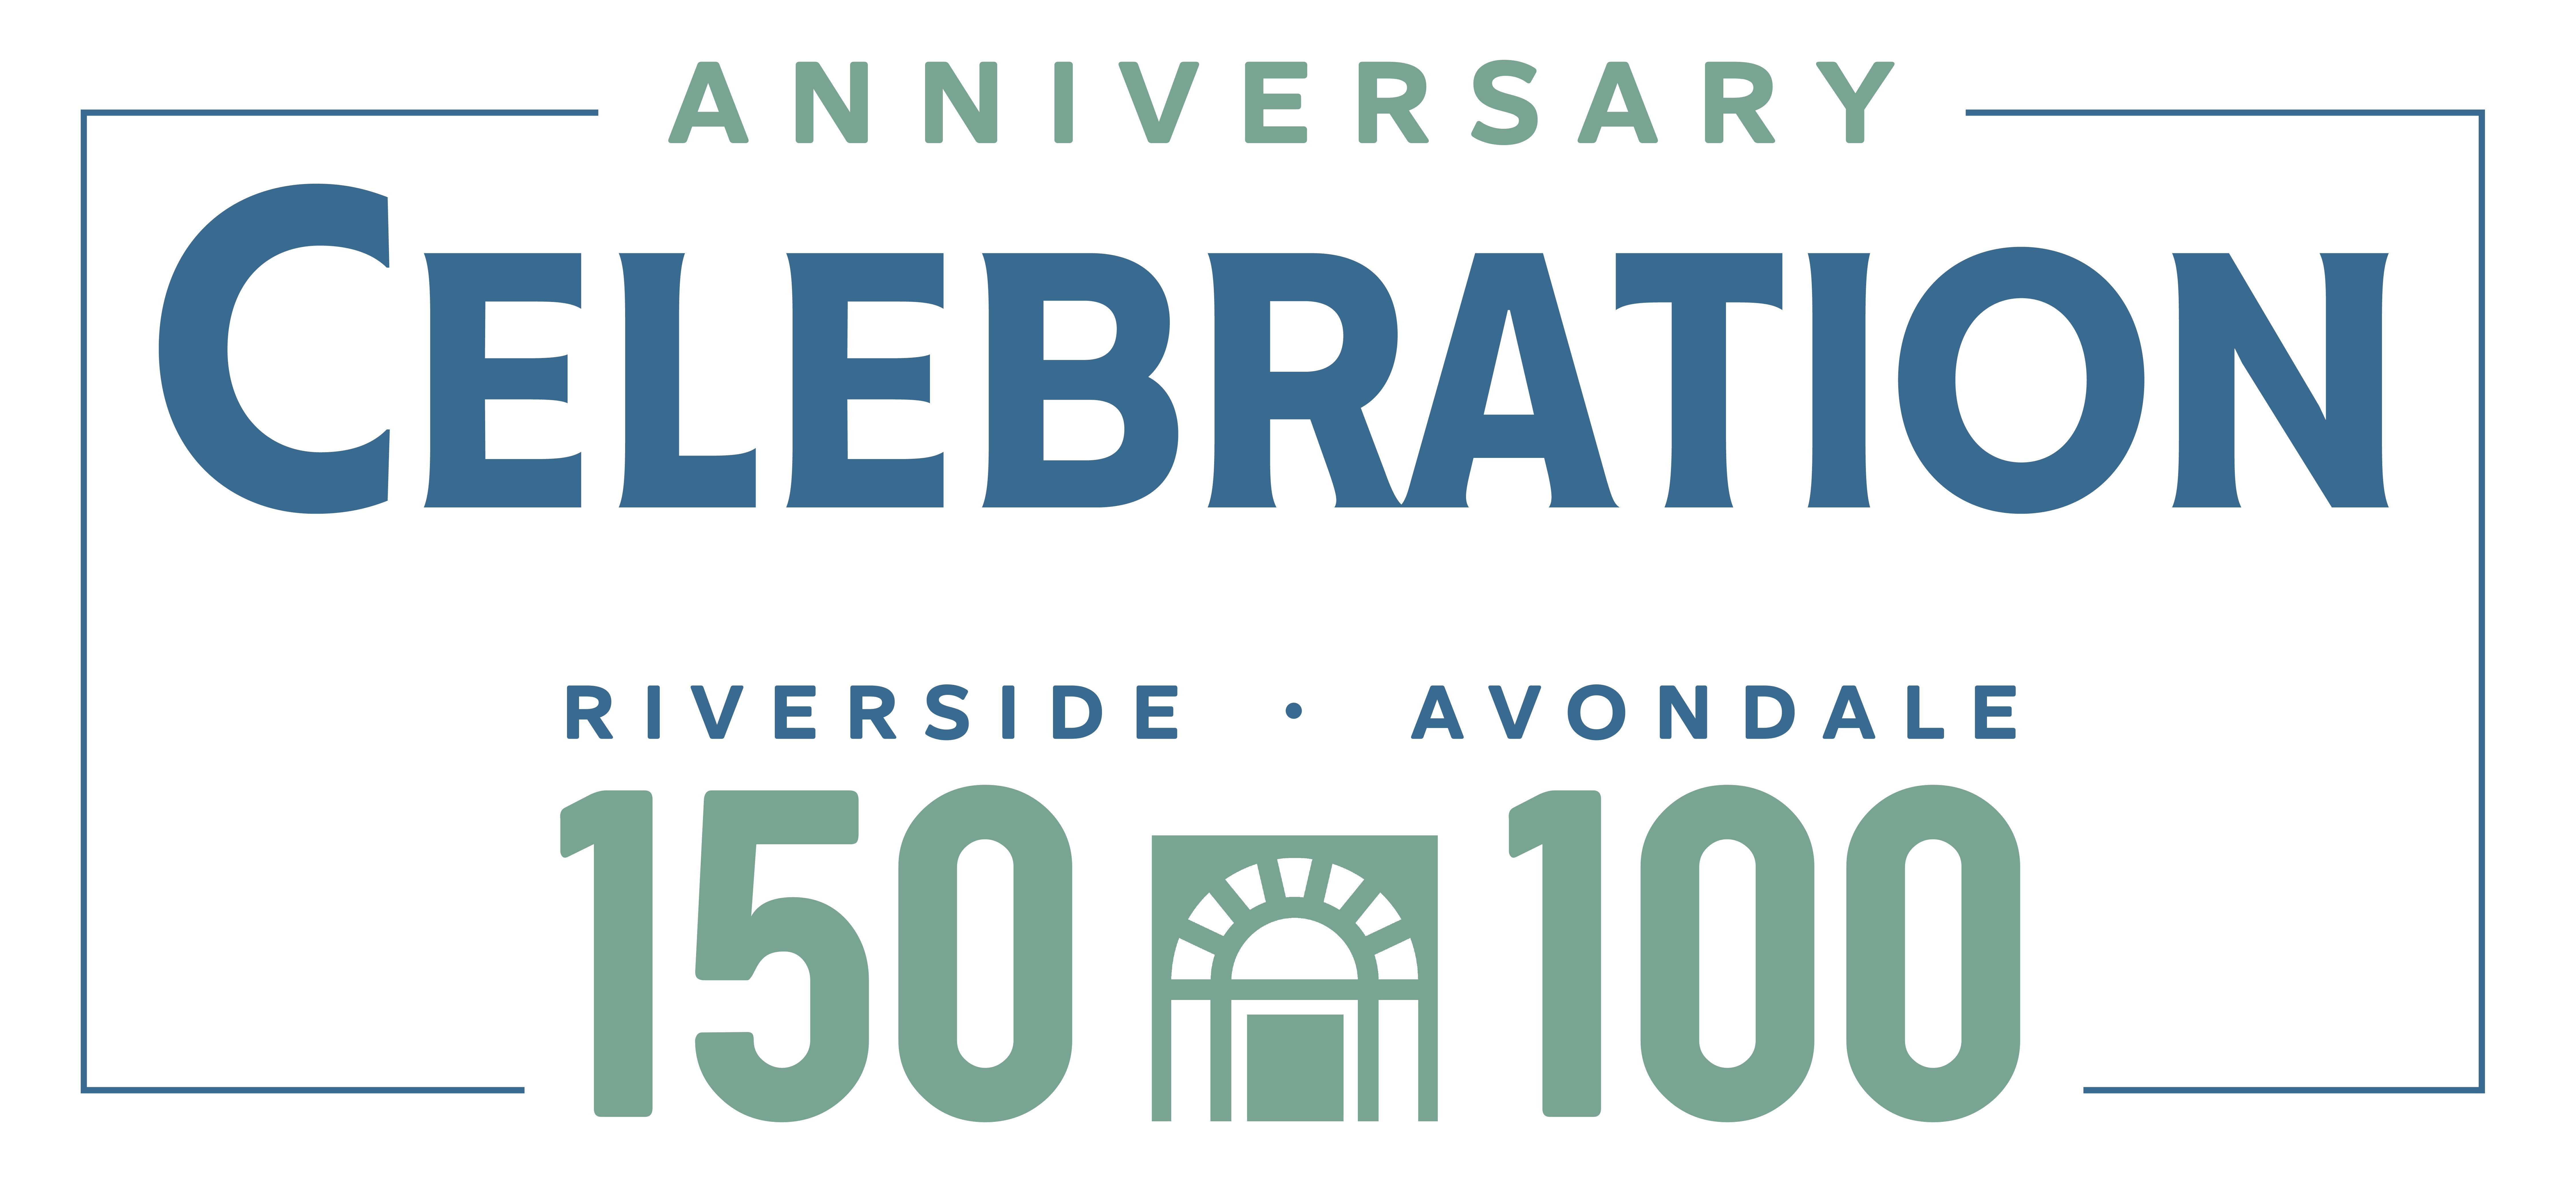 Copy of Anniversary Celebration logo (1)